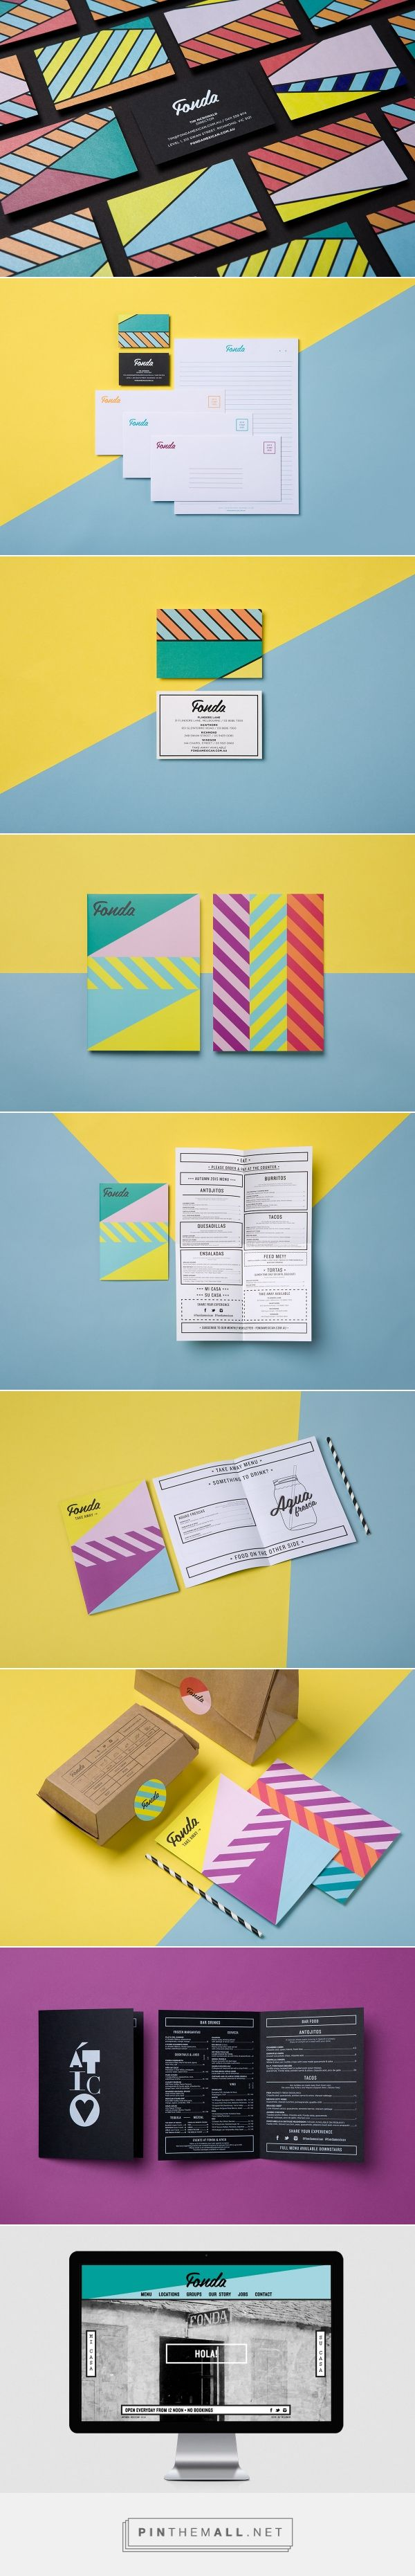 Fonda Mexican Restaurant Branding by WILDHEN DESIGN | Fivestar Branding Agency – Design and Branding Agency & Curated Inspiration Gallery